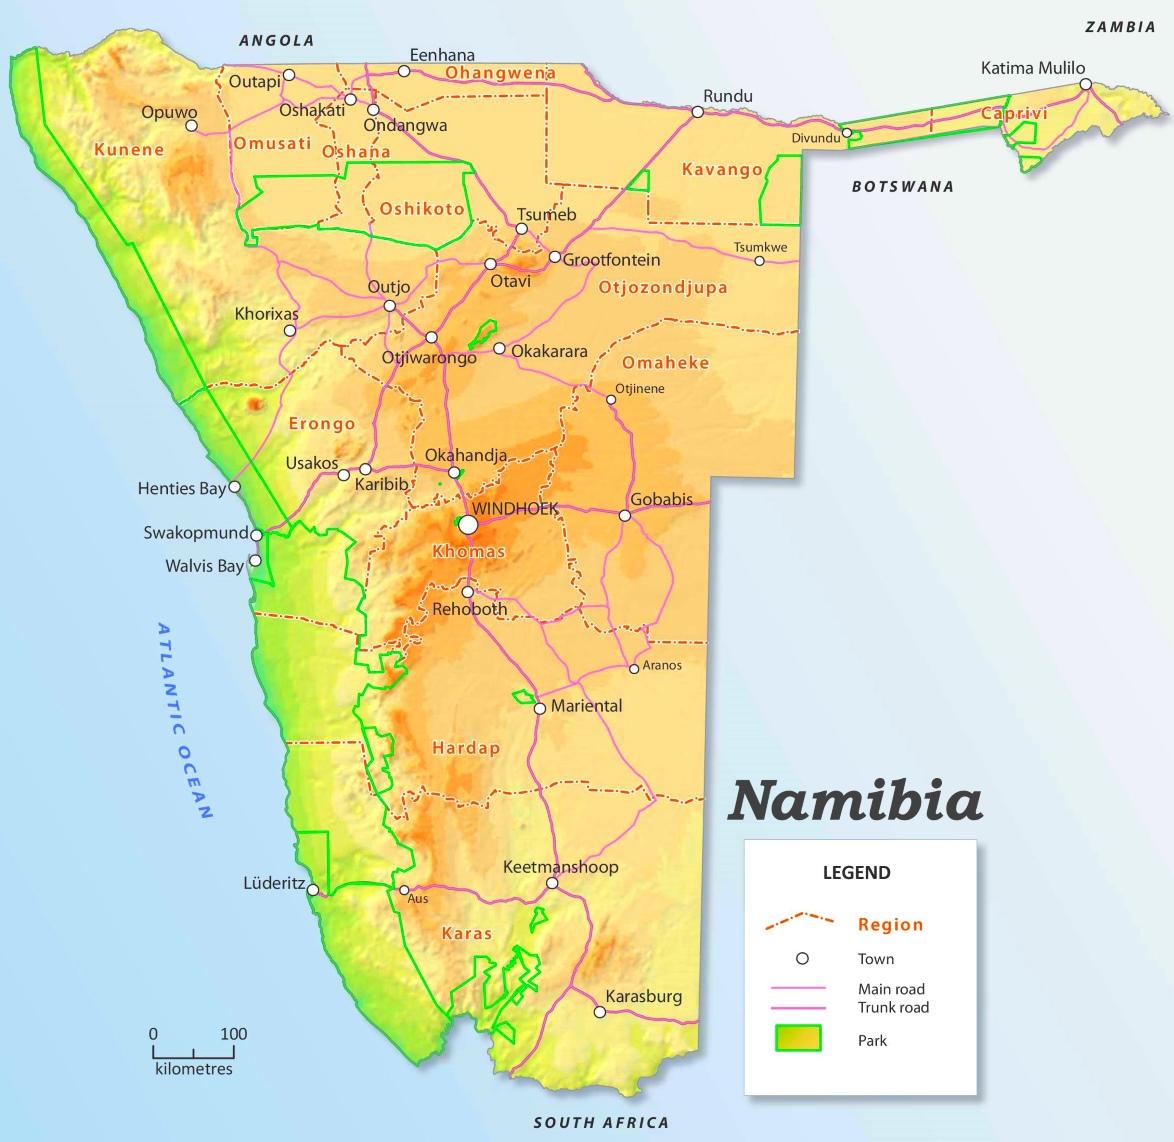 Strassenkarte Von Namibia